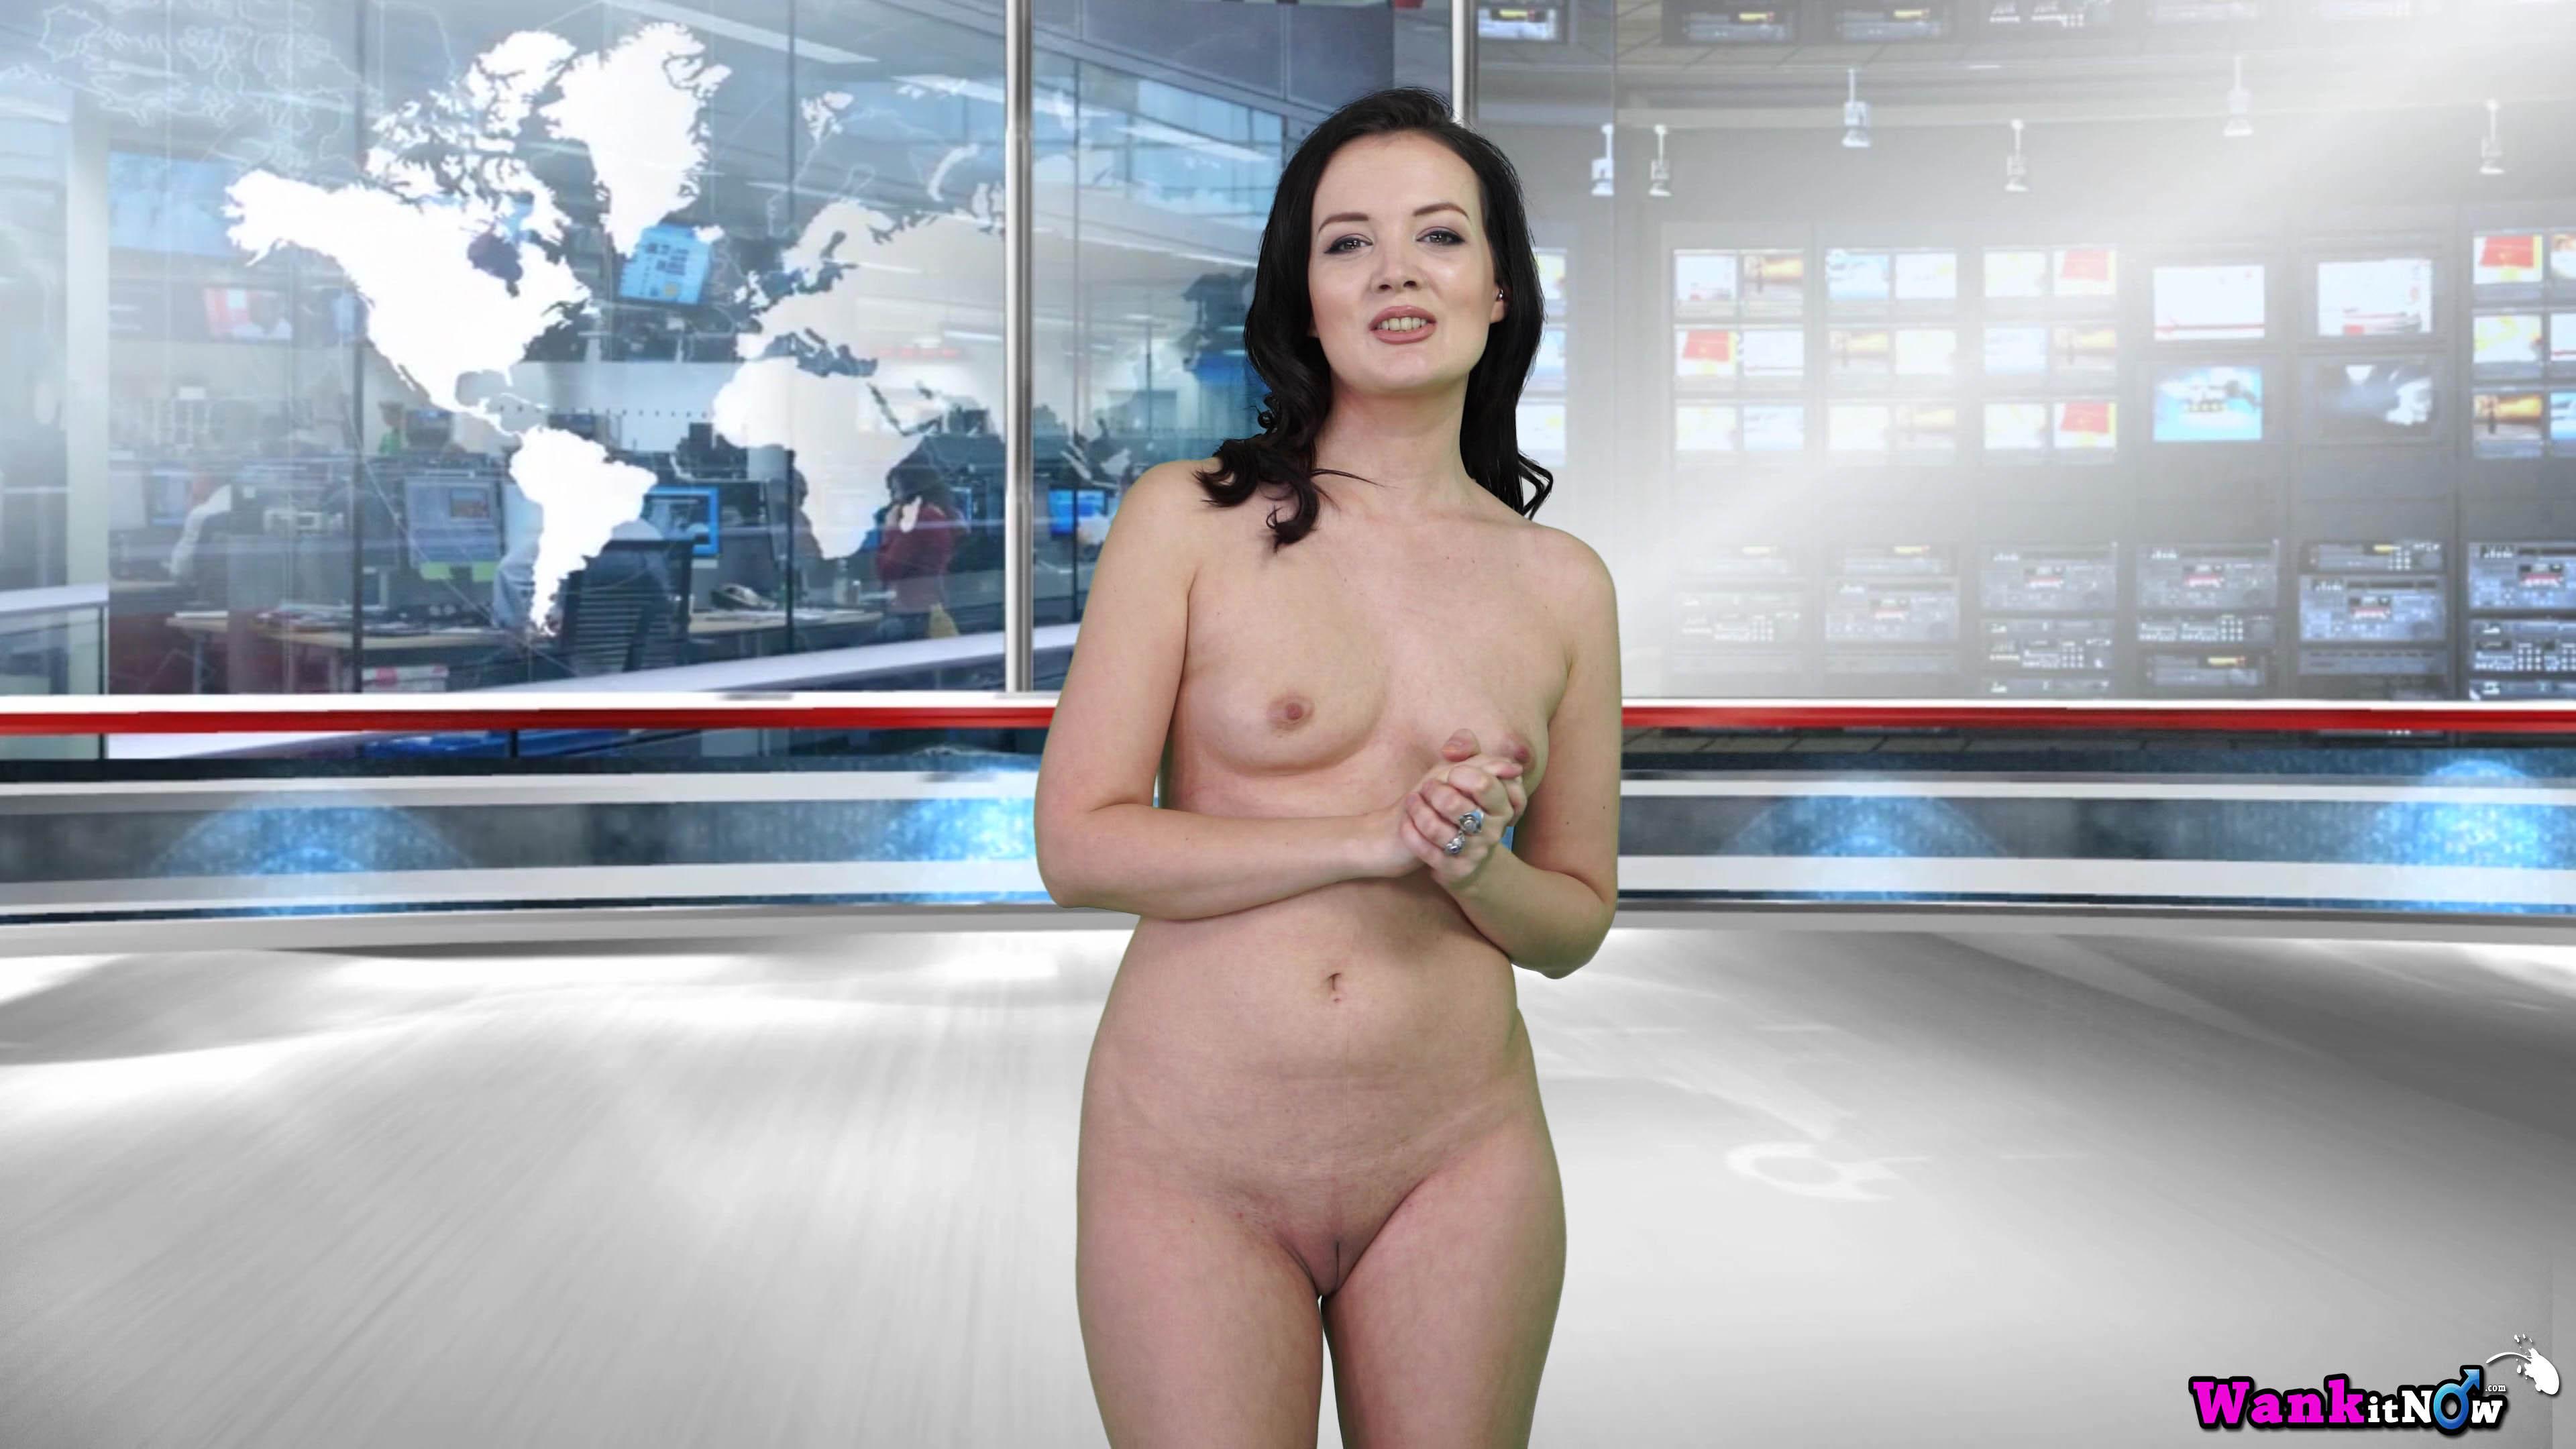 Faye - Wank Holiday Weekend - Free photos of naked girls ...